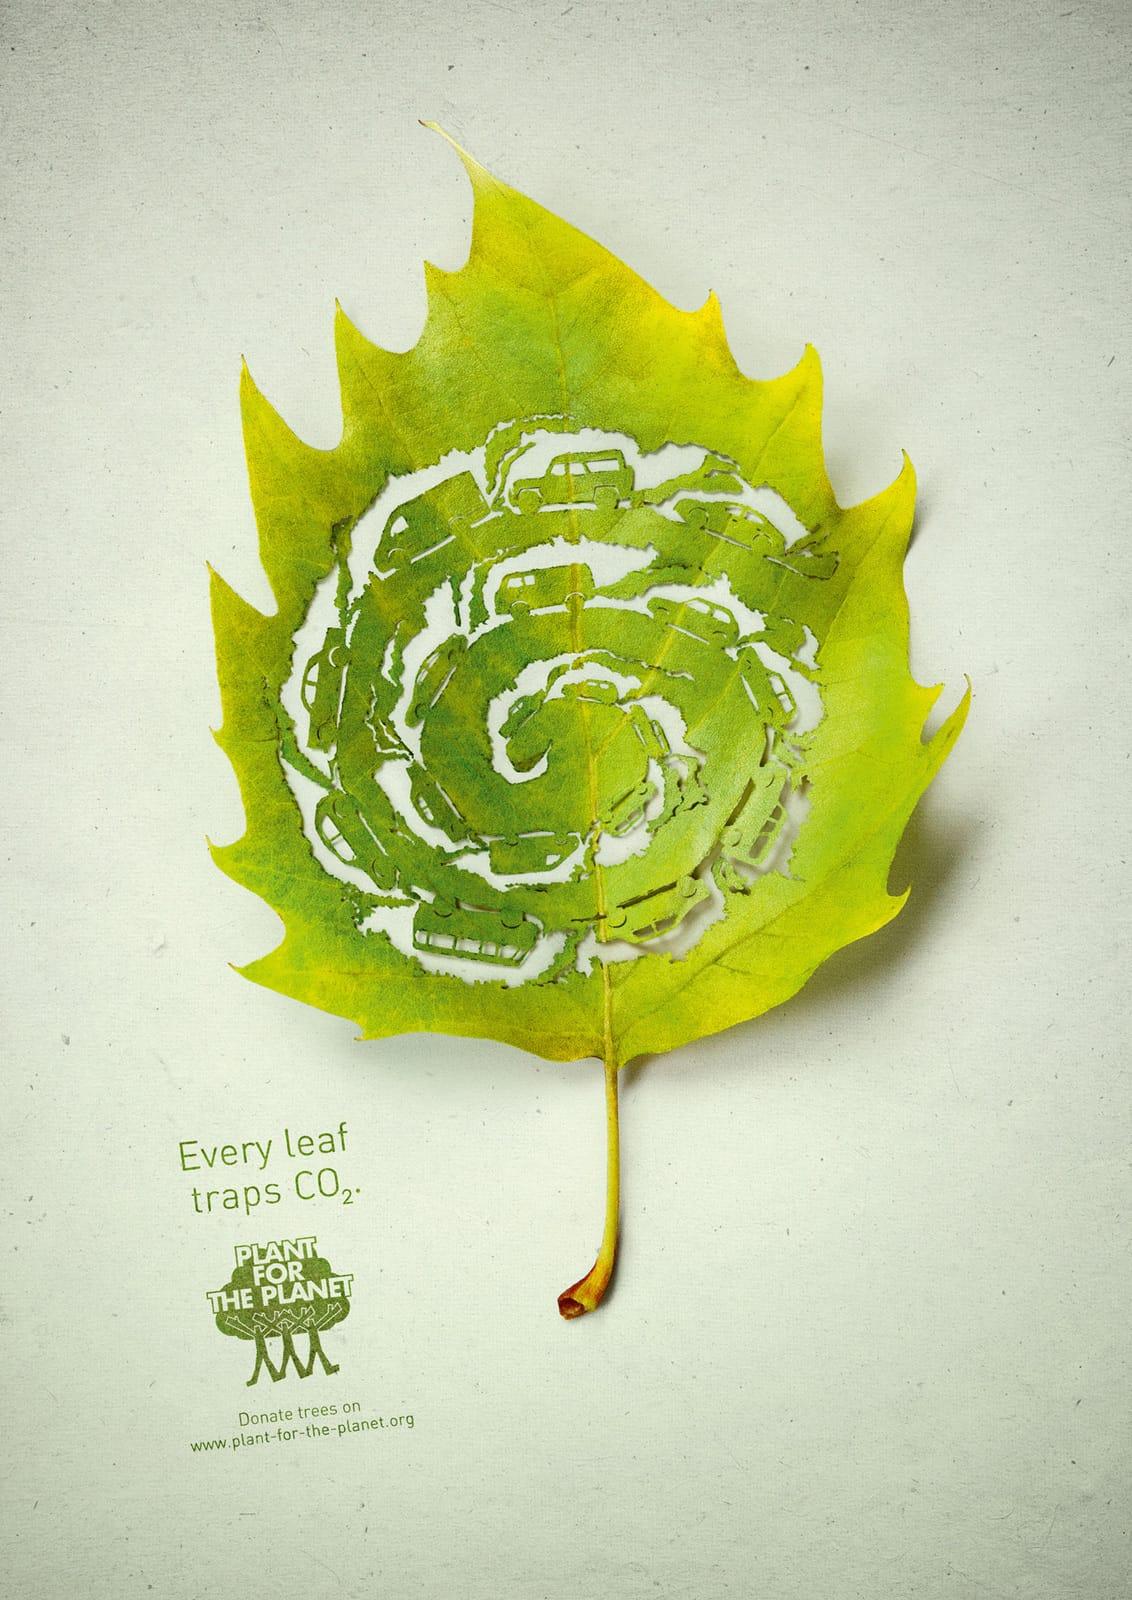 Pub Plant for the Planet